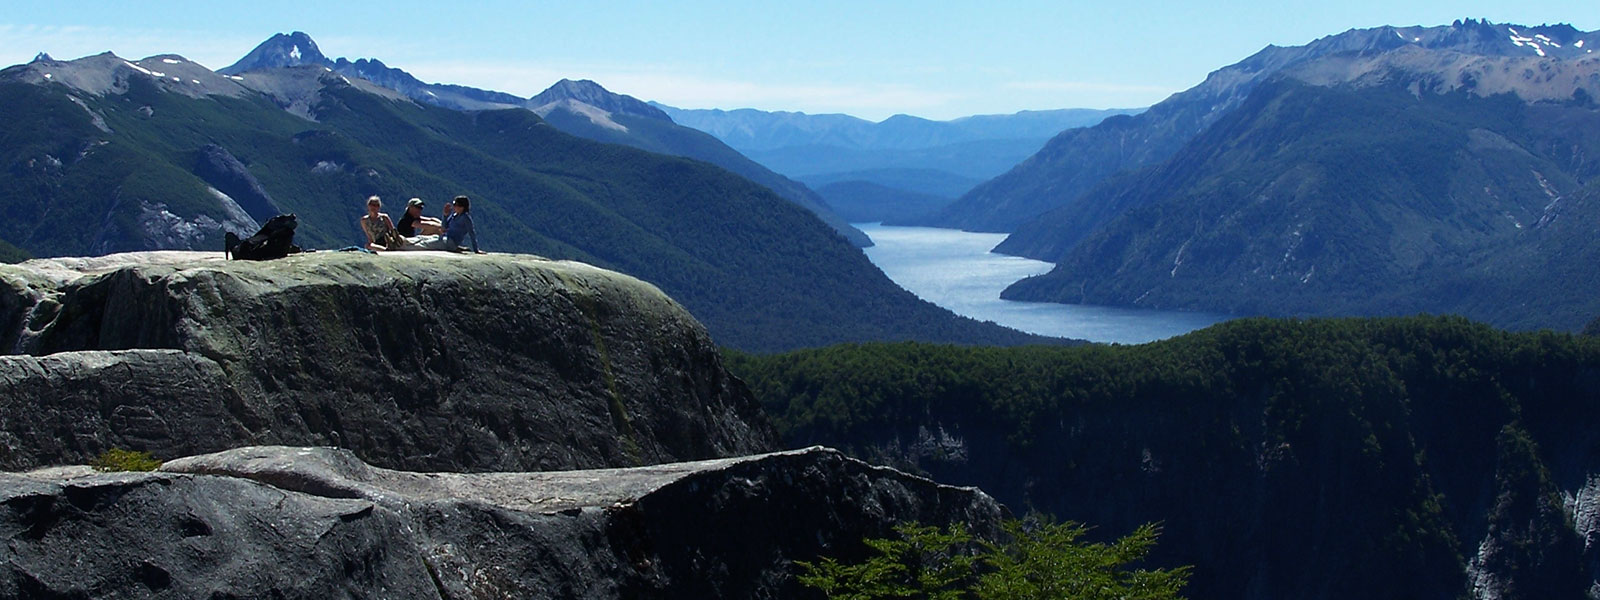 Patagonia Amp Bariloche Guided Trekking Traverses Hiking